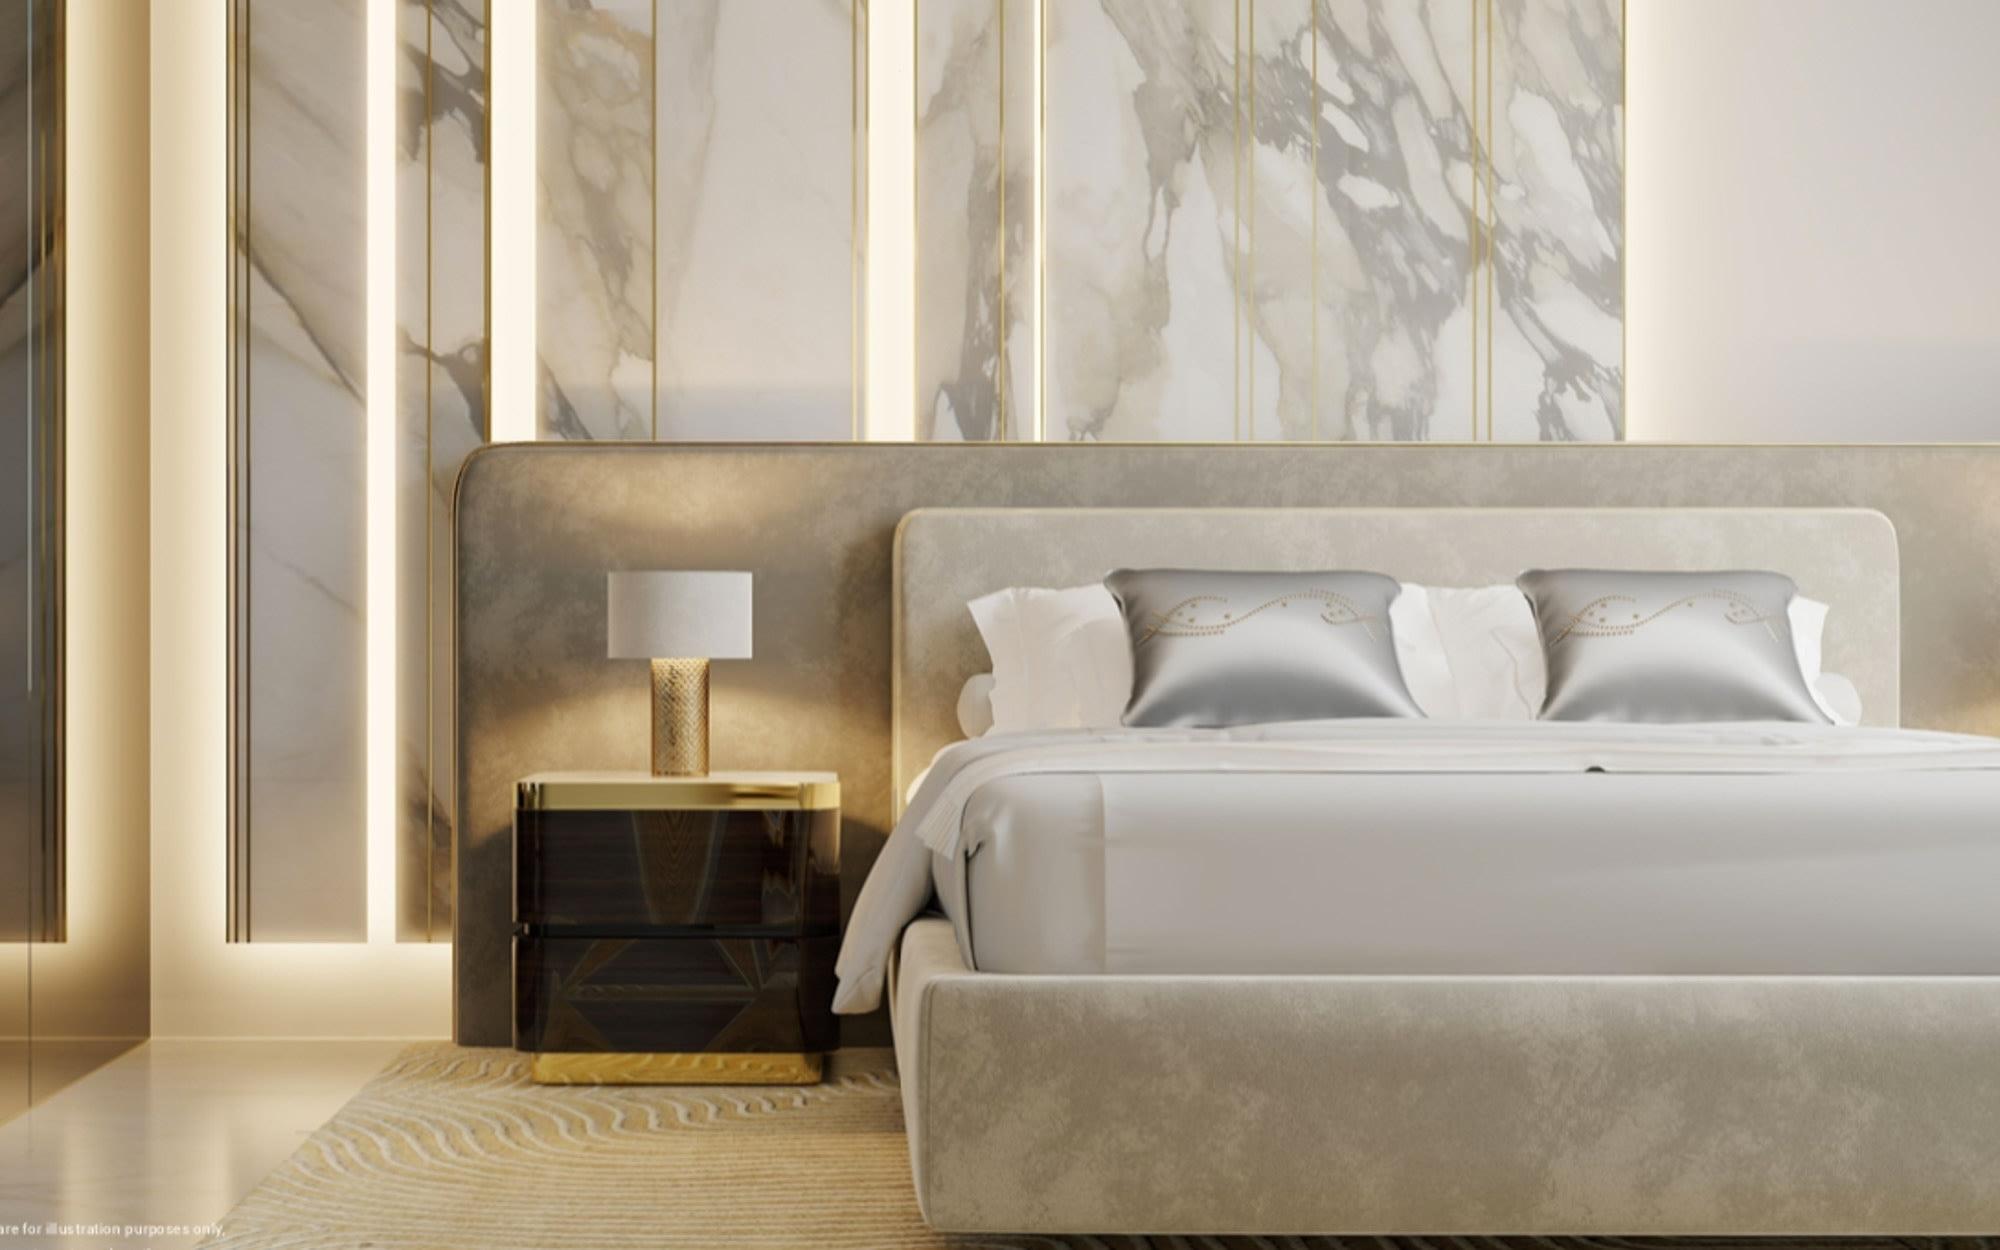 Spectacular Marina View Apartment - Brand New